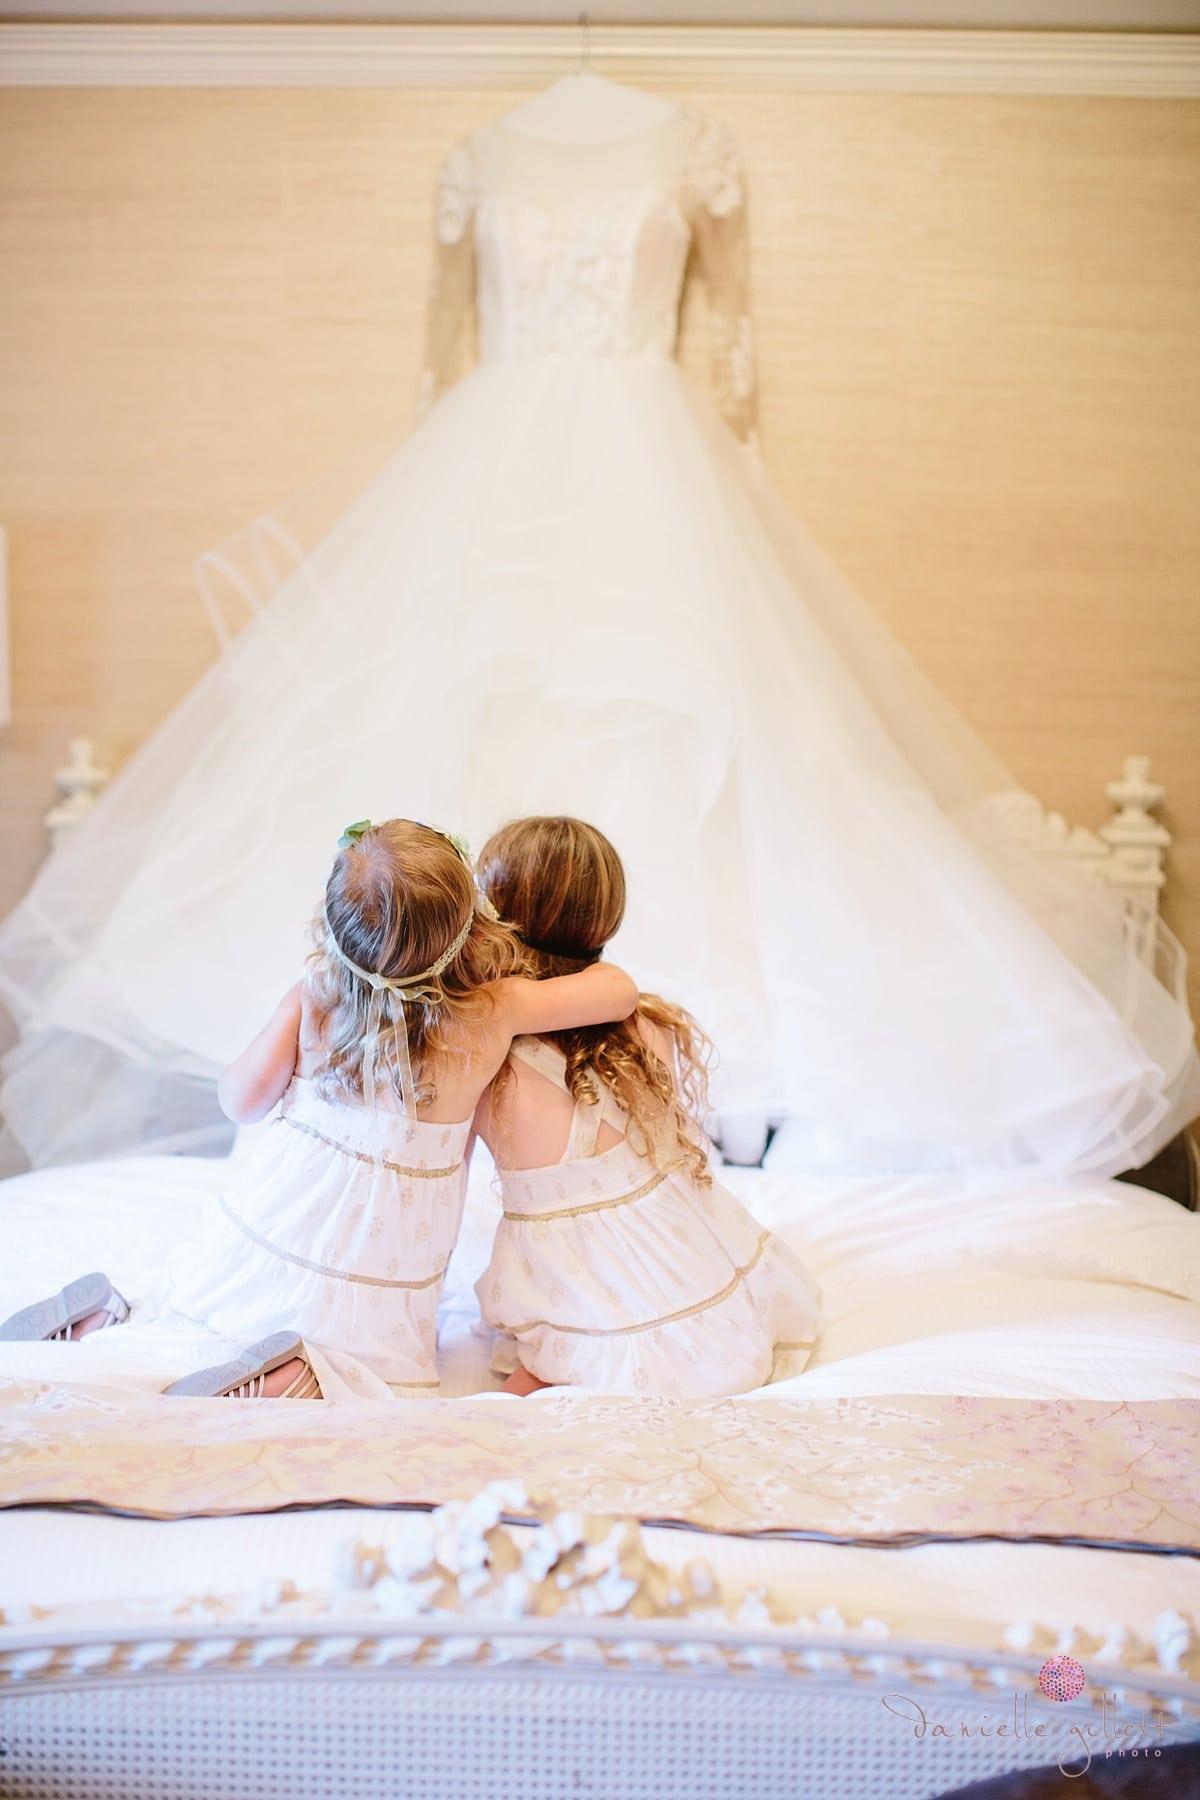 Nesldown Wedding, Danielle Gillett Photography, Whimsical Wedding, Bohemian Wedding, Bay Area Wedding, Fairytale wedding, Santa Cruz Wedding, Redwood Wedding, Flower Girl